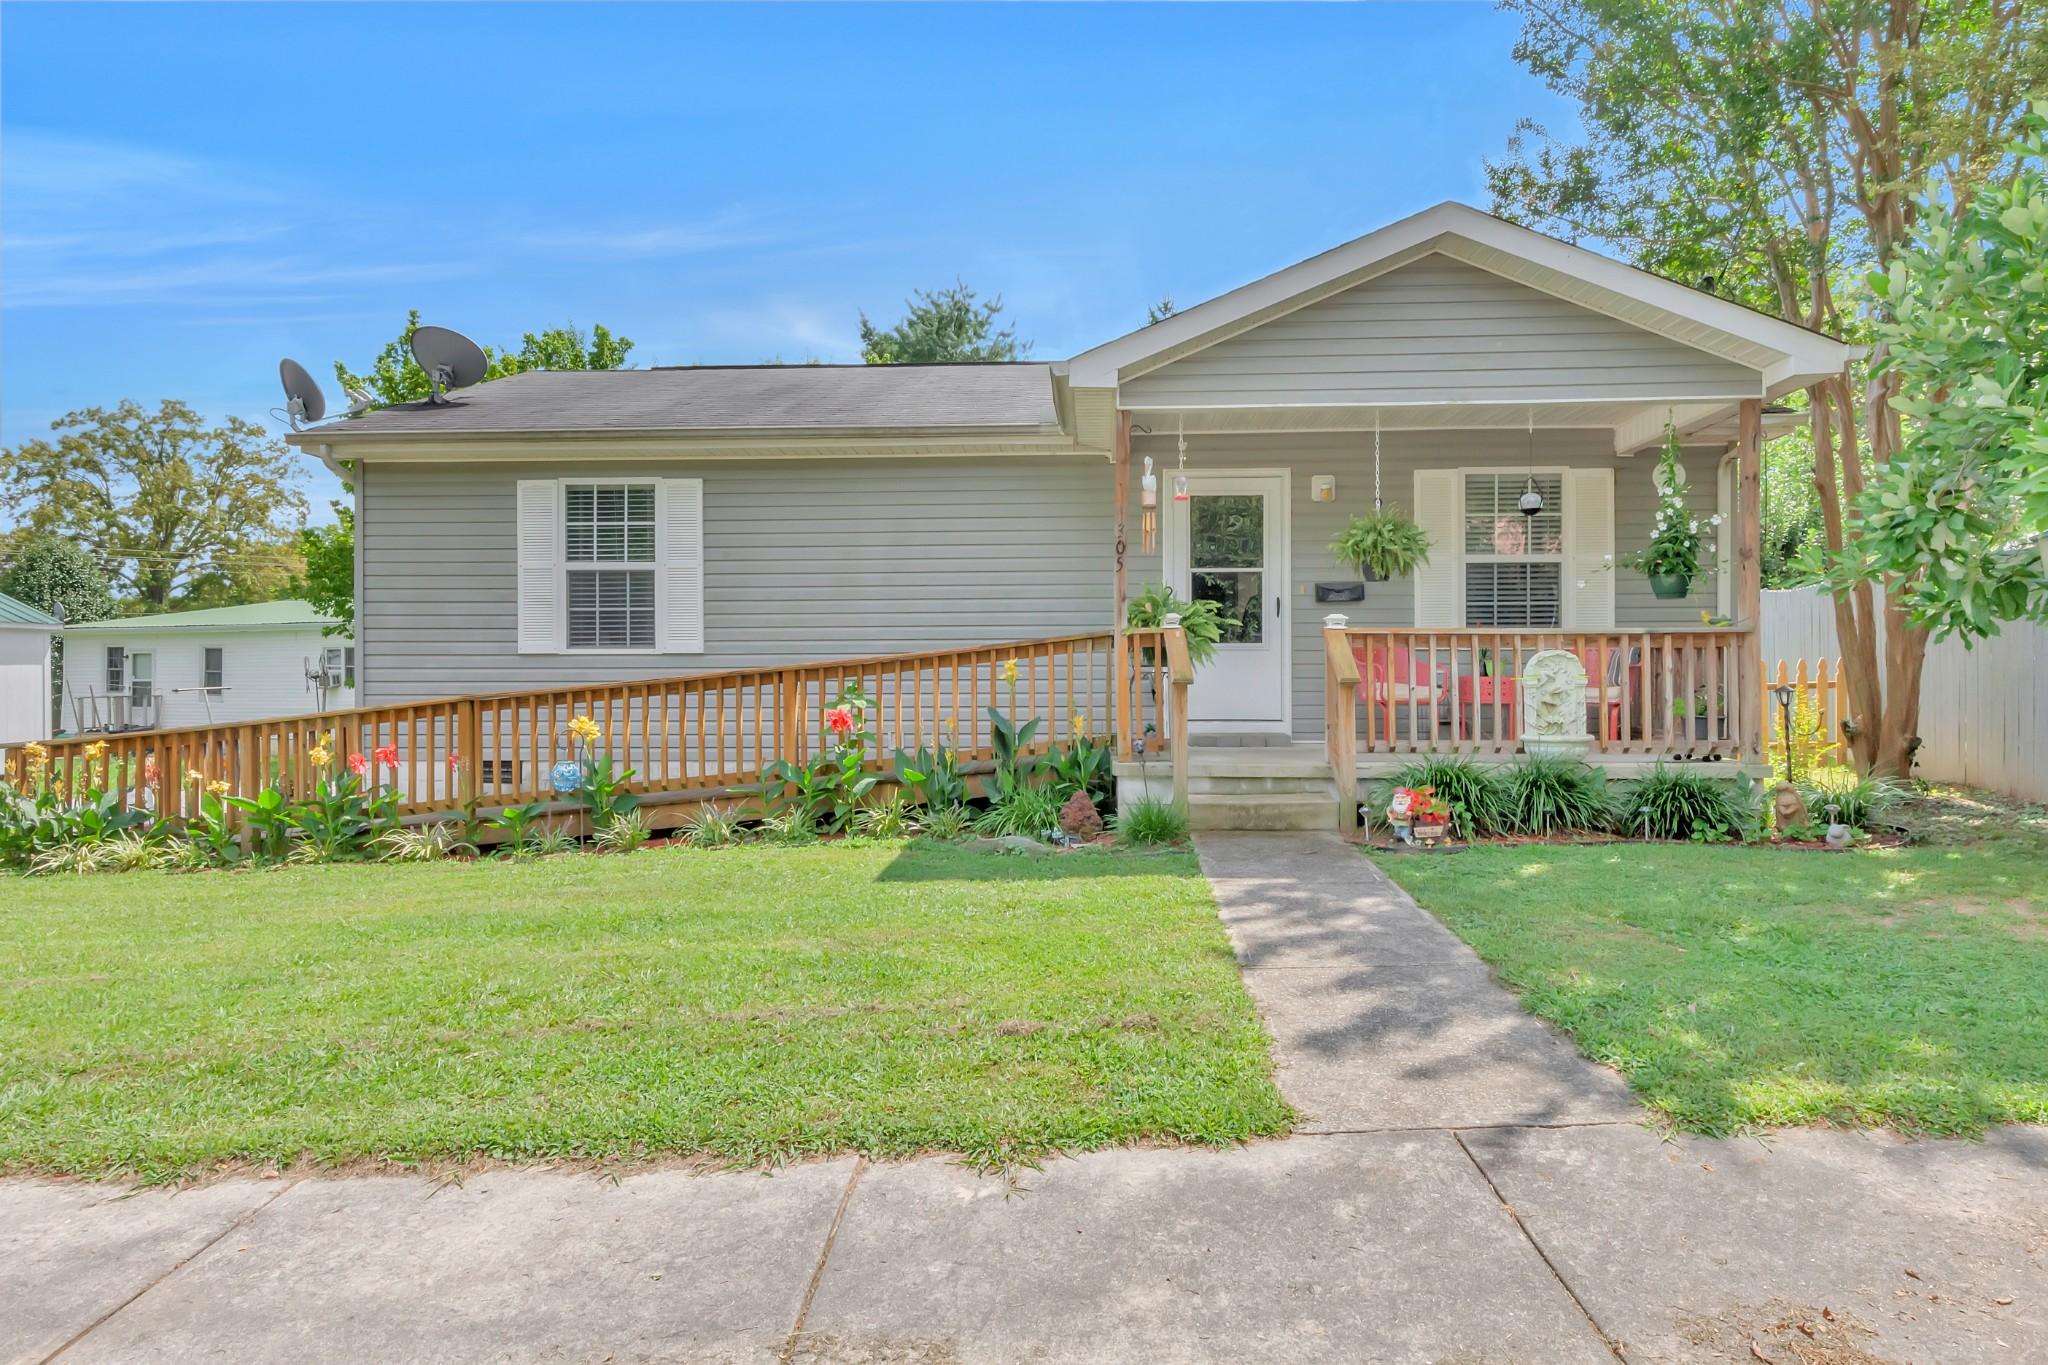 305 Jackson St Property Photo - Smithville, TN real estate listing